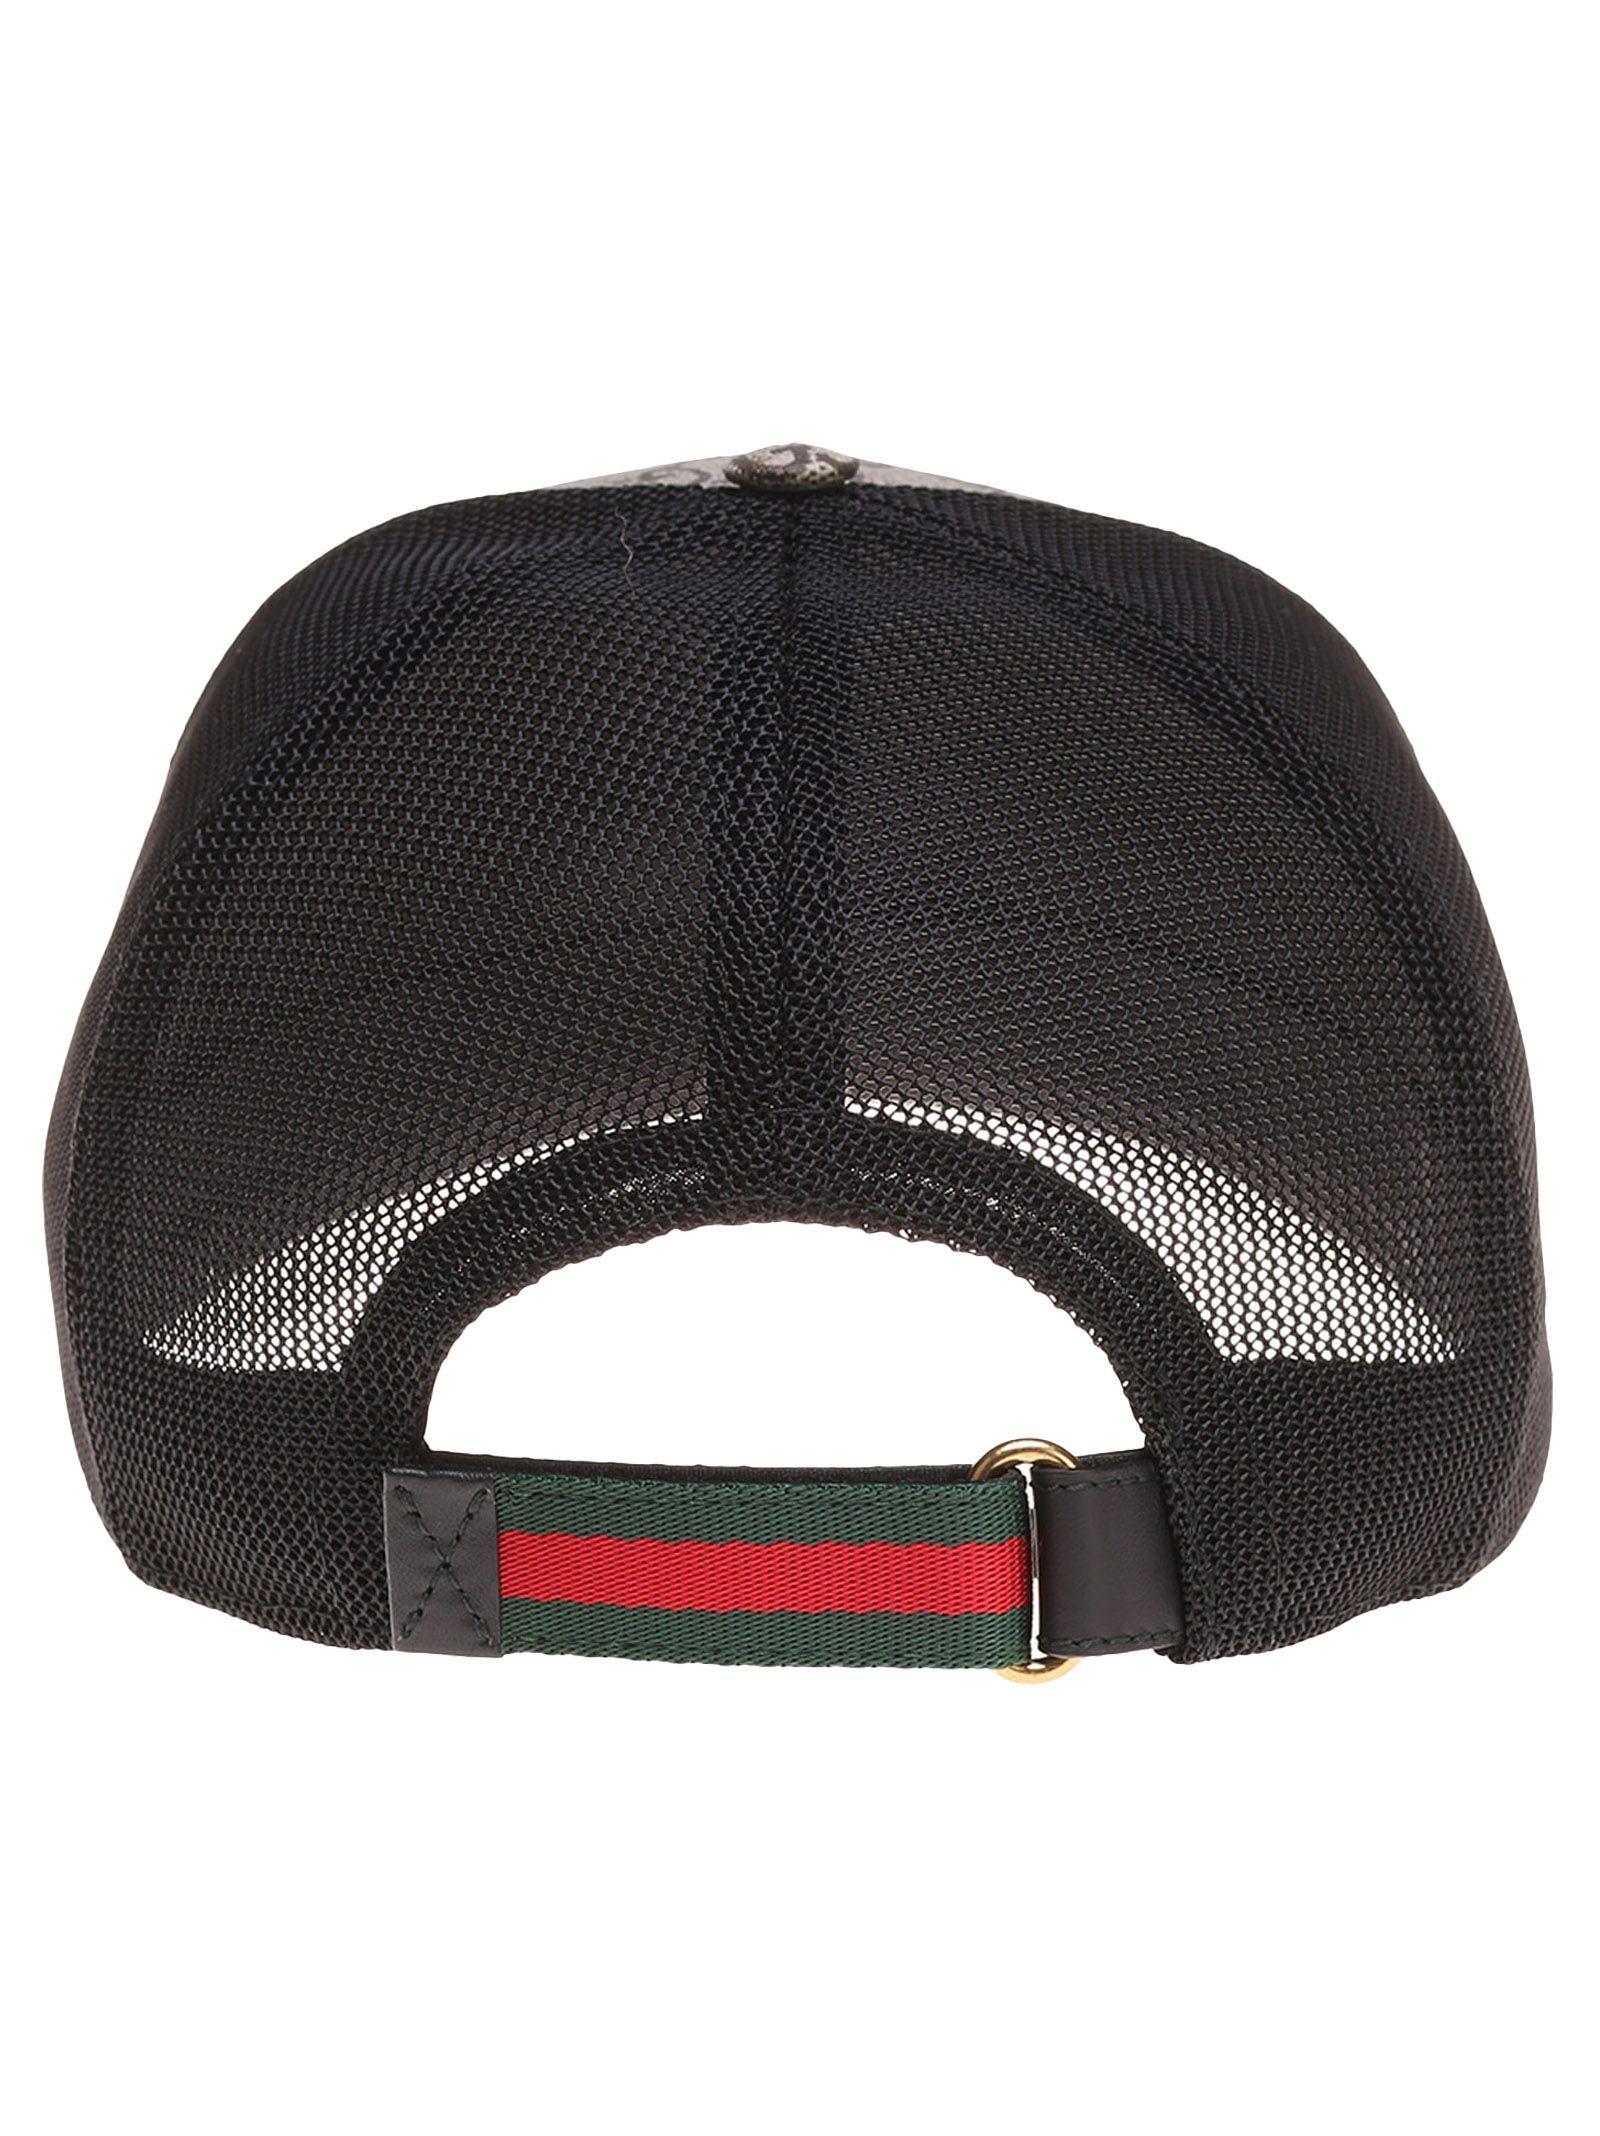 264dda1b GUCCI BEE PRINT GG SUPREME BASEBALL HAT. #gucci # | Gucci Men | Hats ...